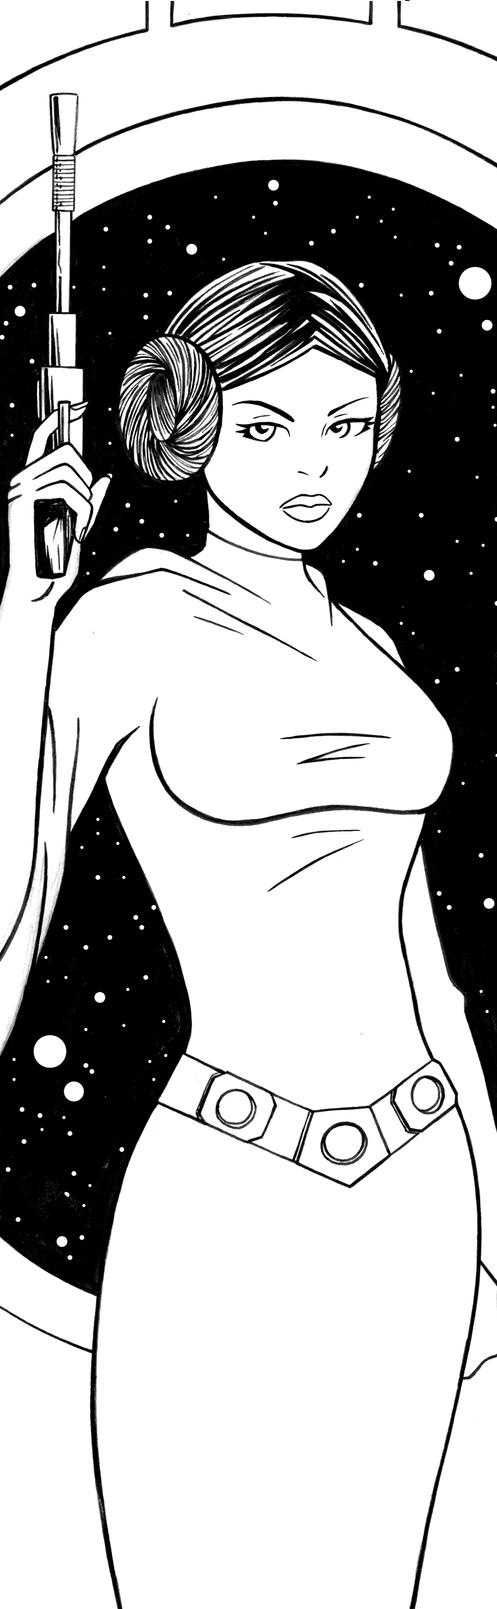 Princess Leia Art Inks by RichBernatovech